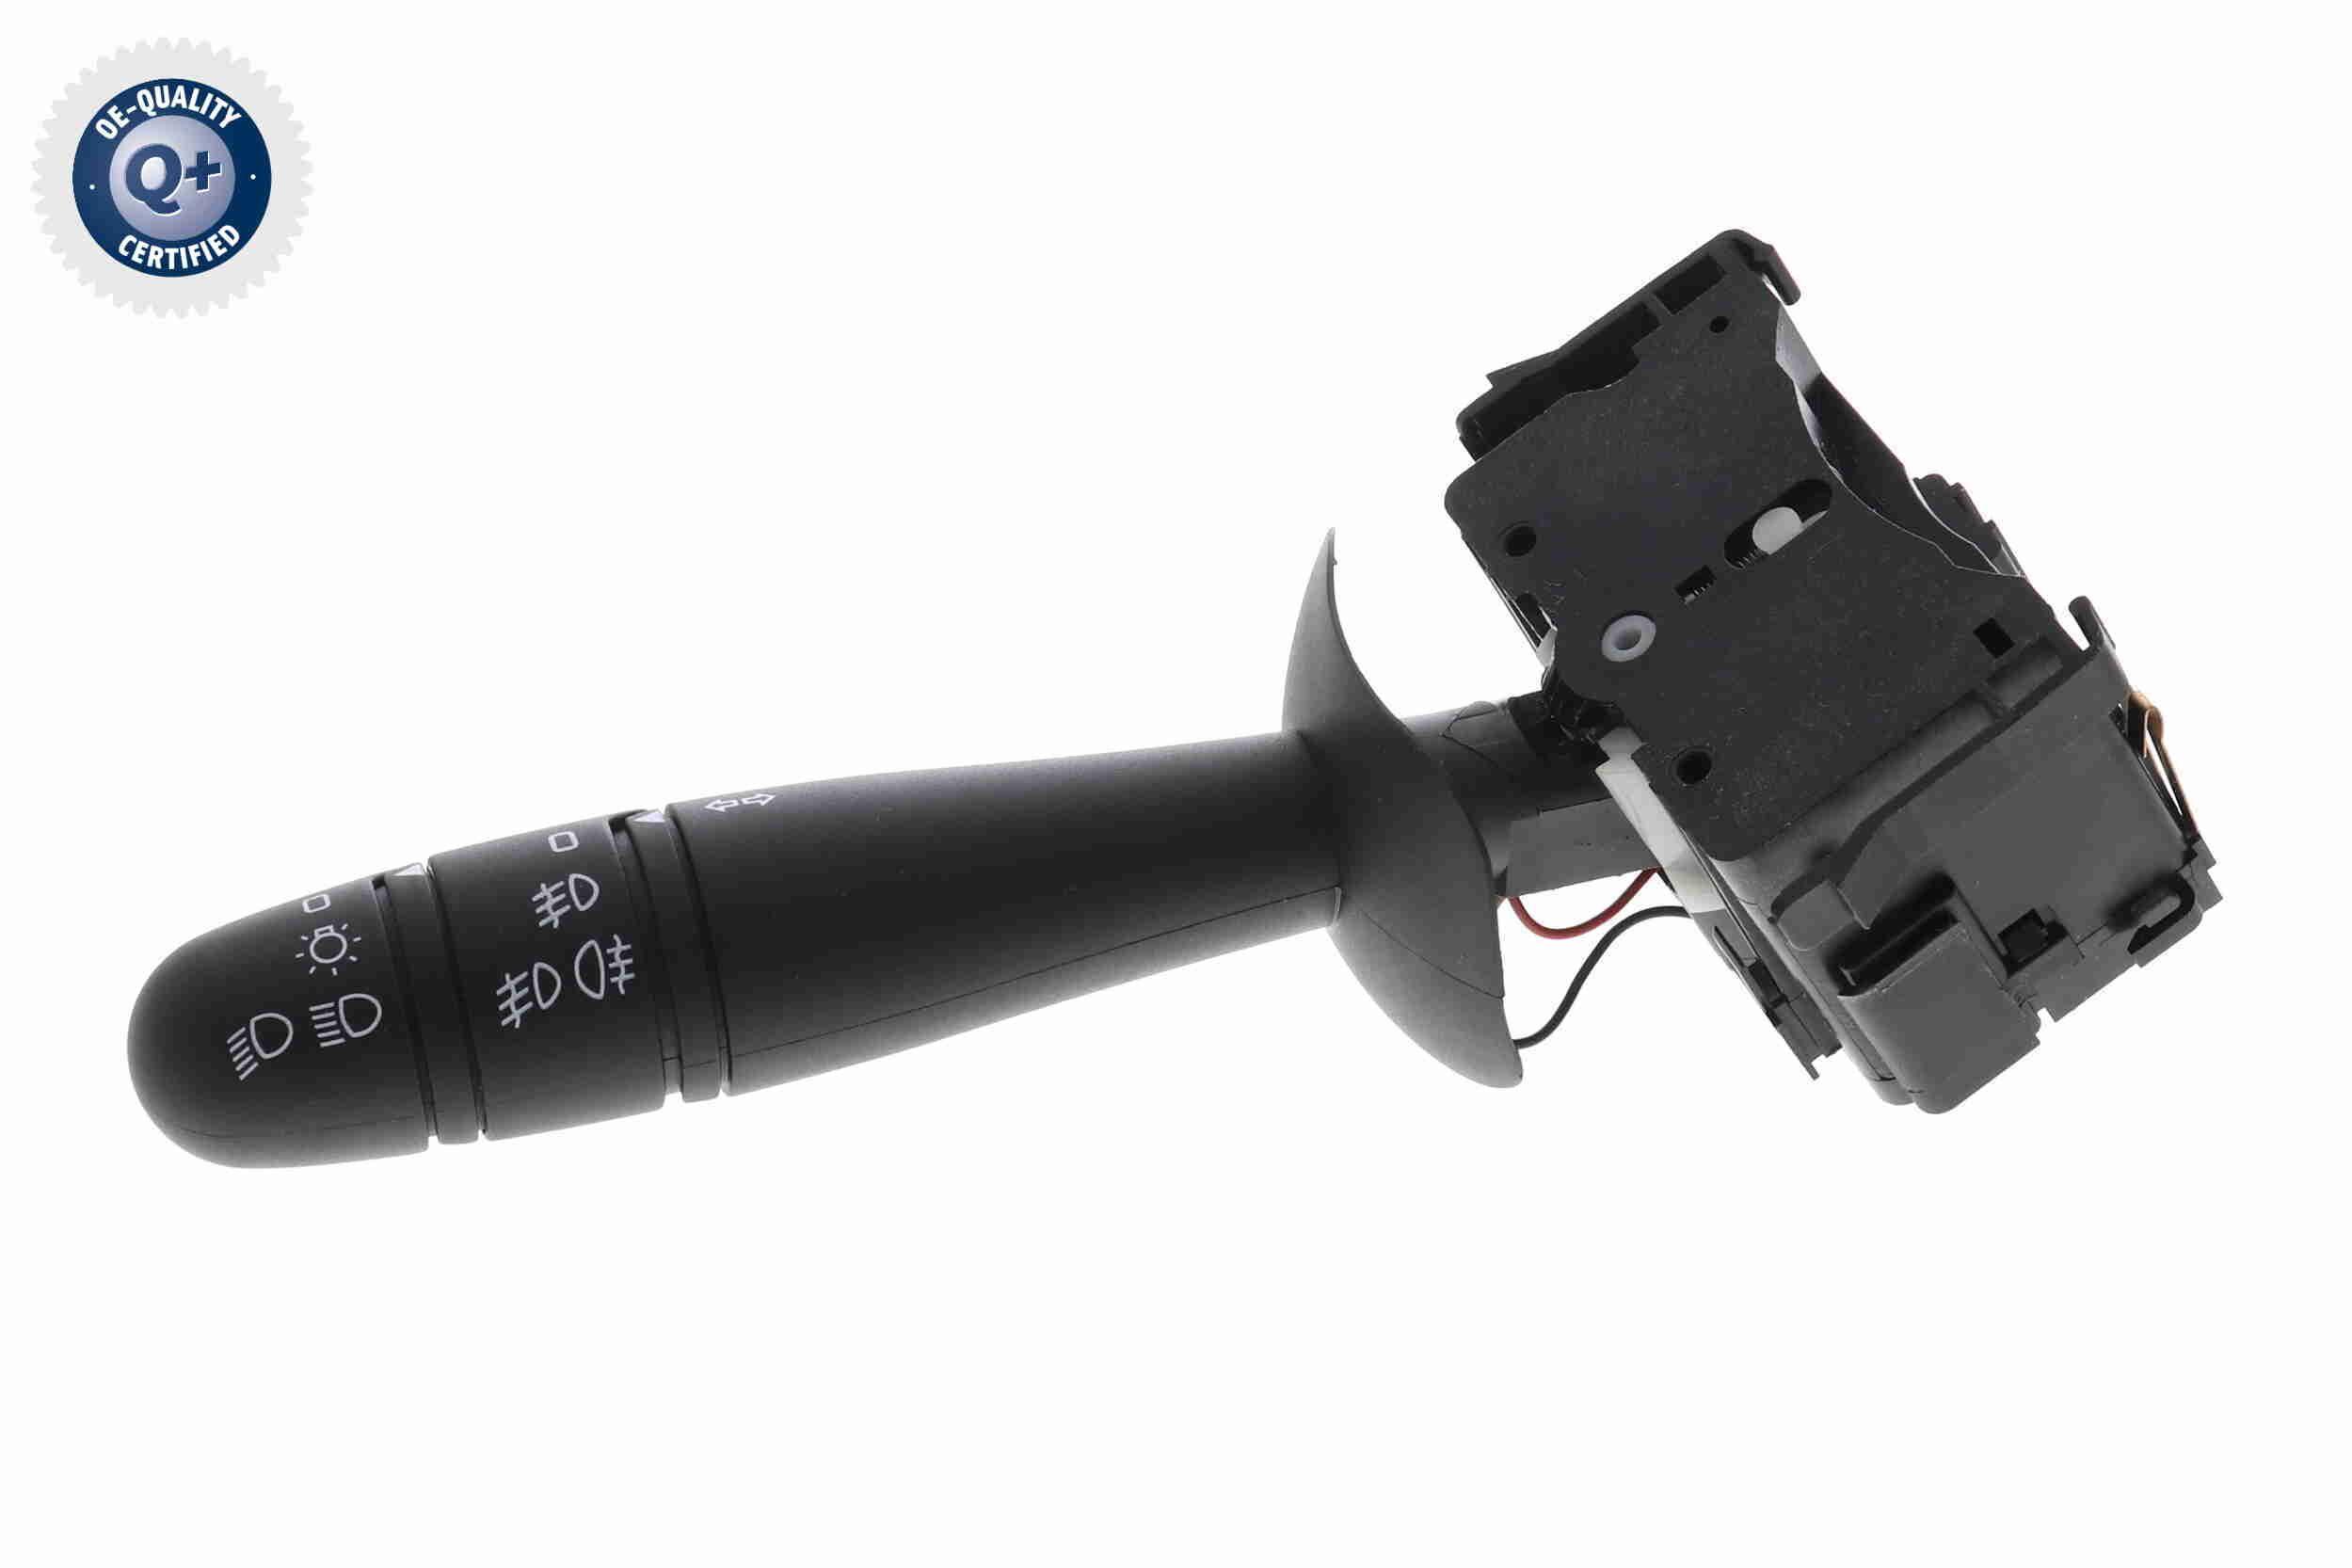 Lenkstockschalter V40-80-2439 Laguna II Grandtour (KG) 1.9 dCi 100 PS Premium Autoteile-Angebot